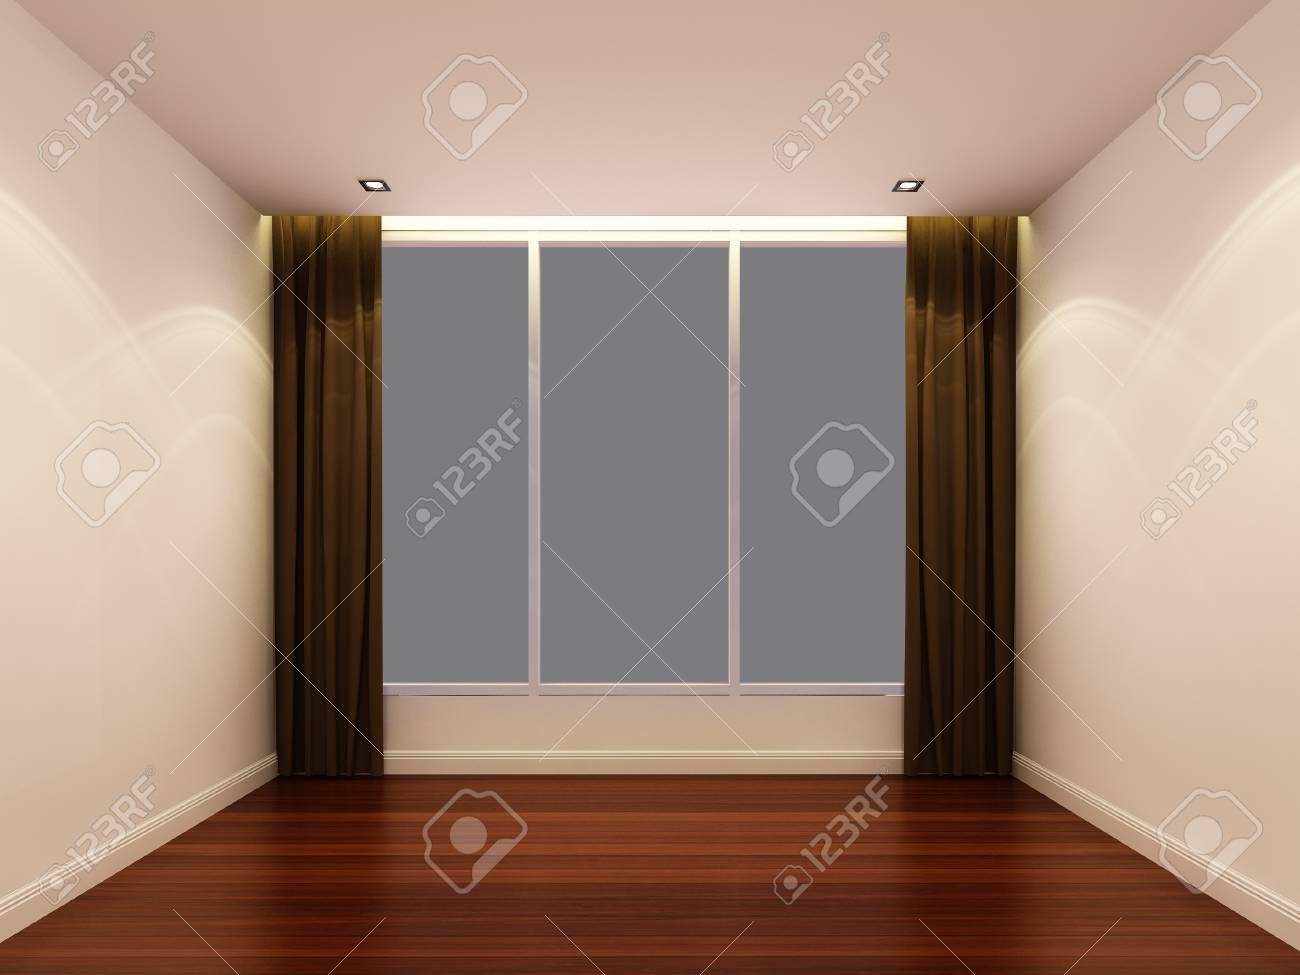 Empty white room at night Stock Photo - 23397745